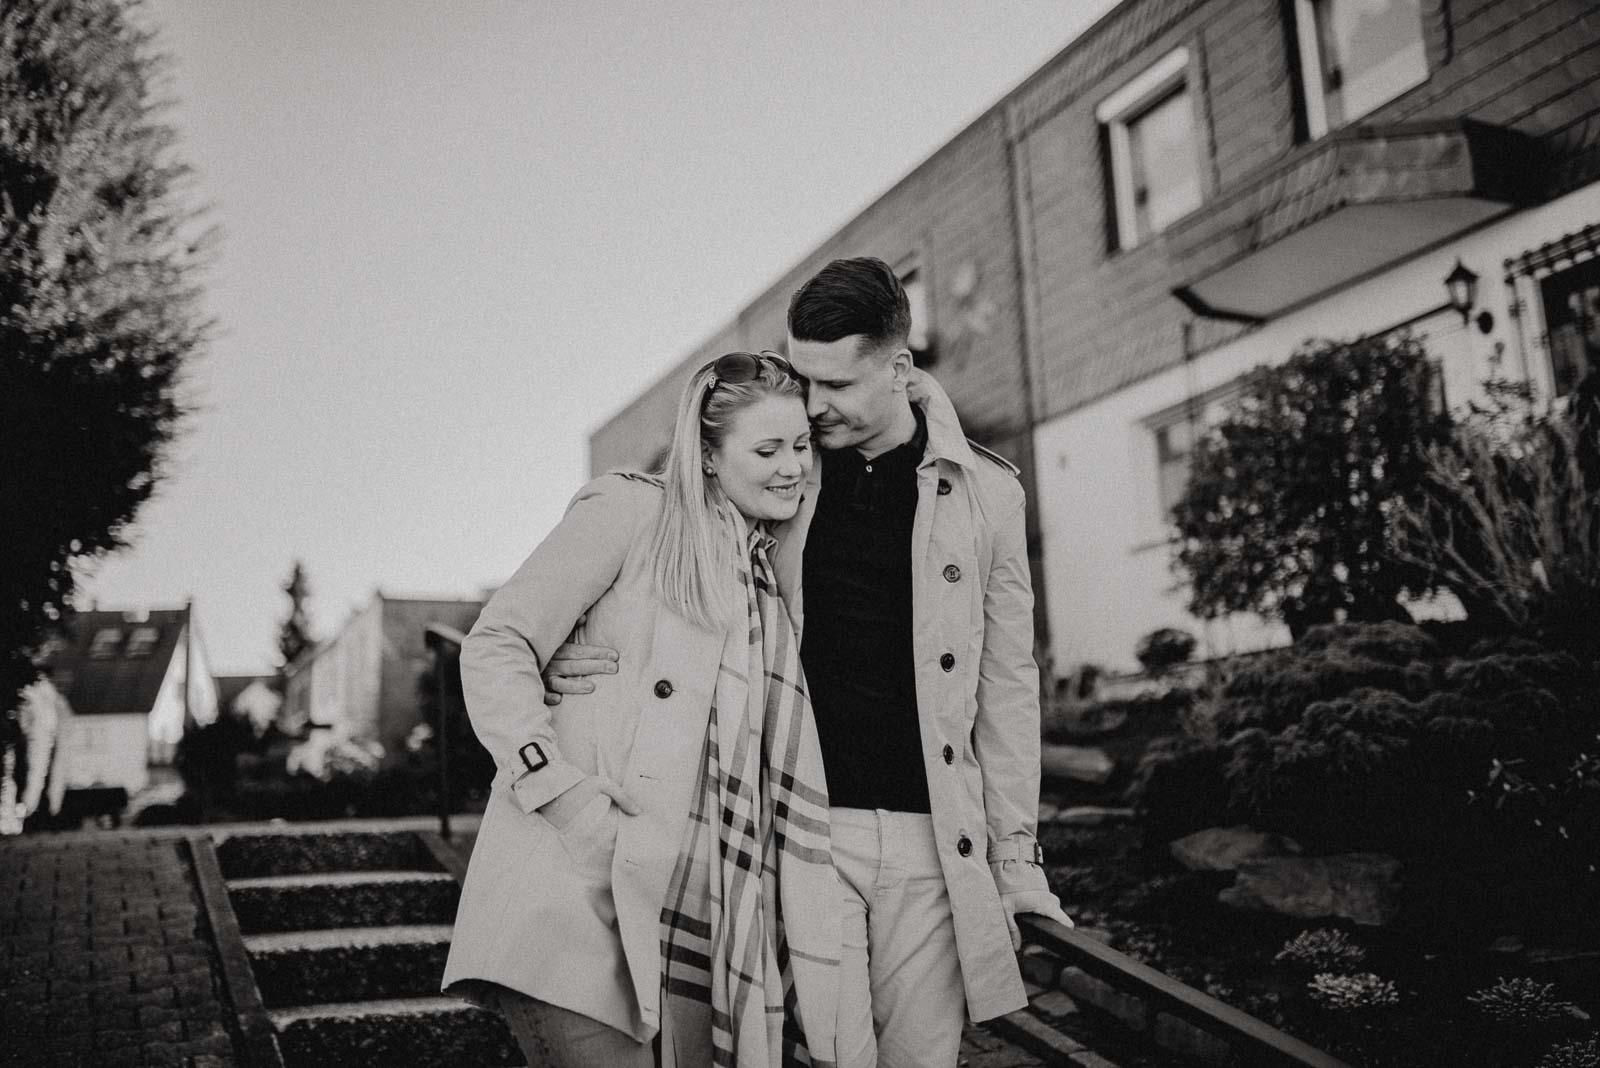 003-fotospaziergang-fotograf-witten-paarshooting